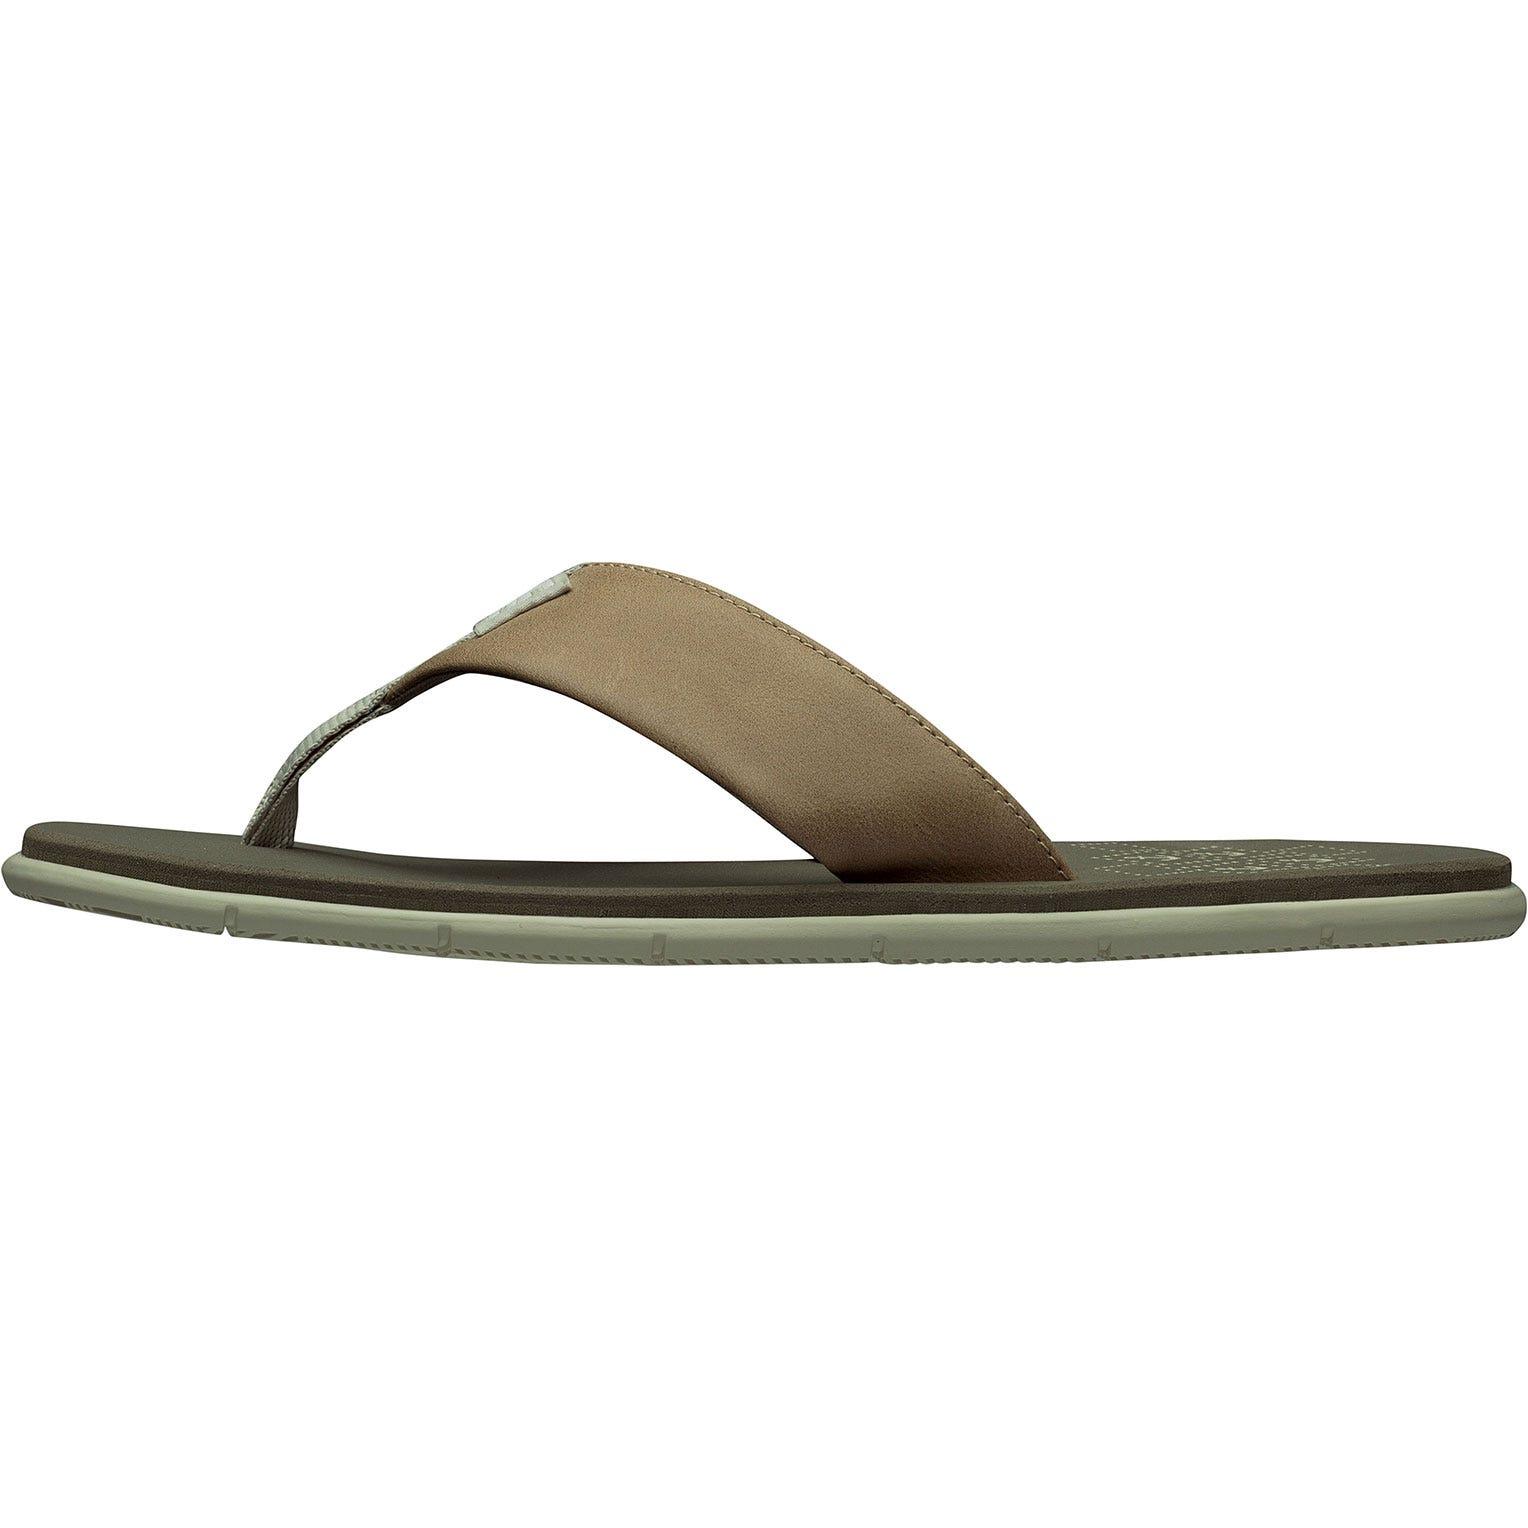 Helly Hansen W Seasand Leather Sandal Womens Beige 39.3/8